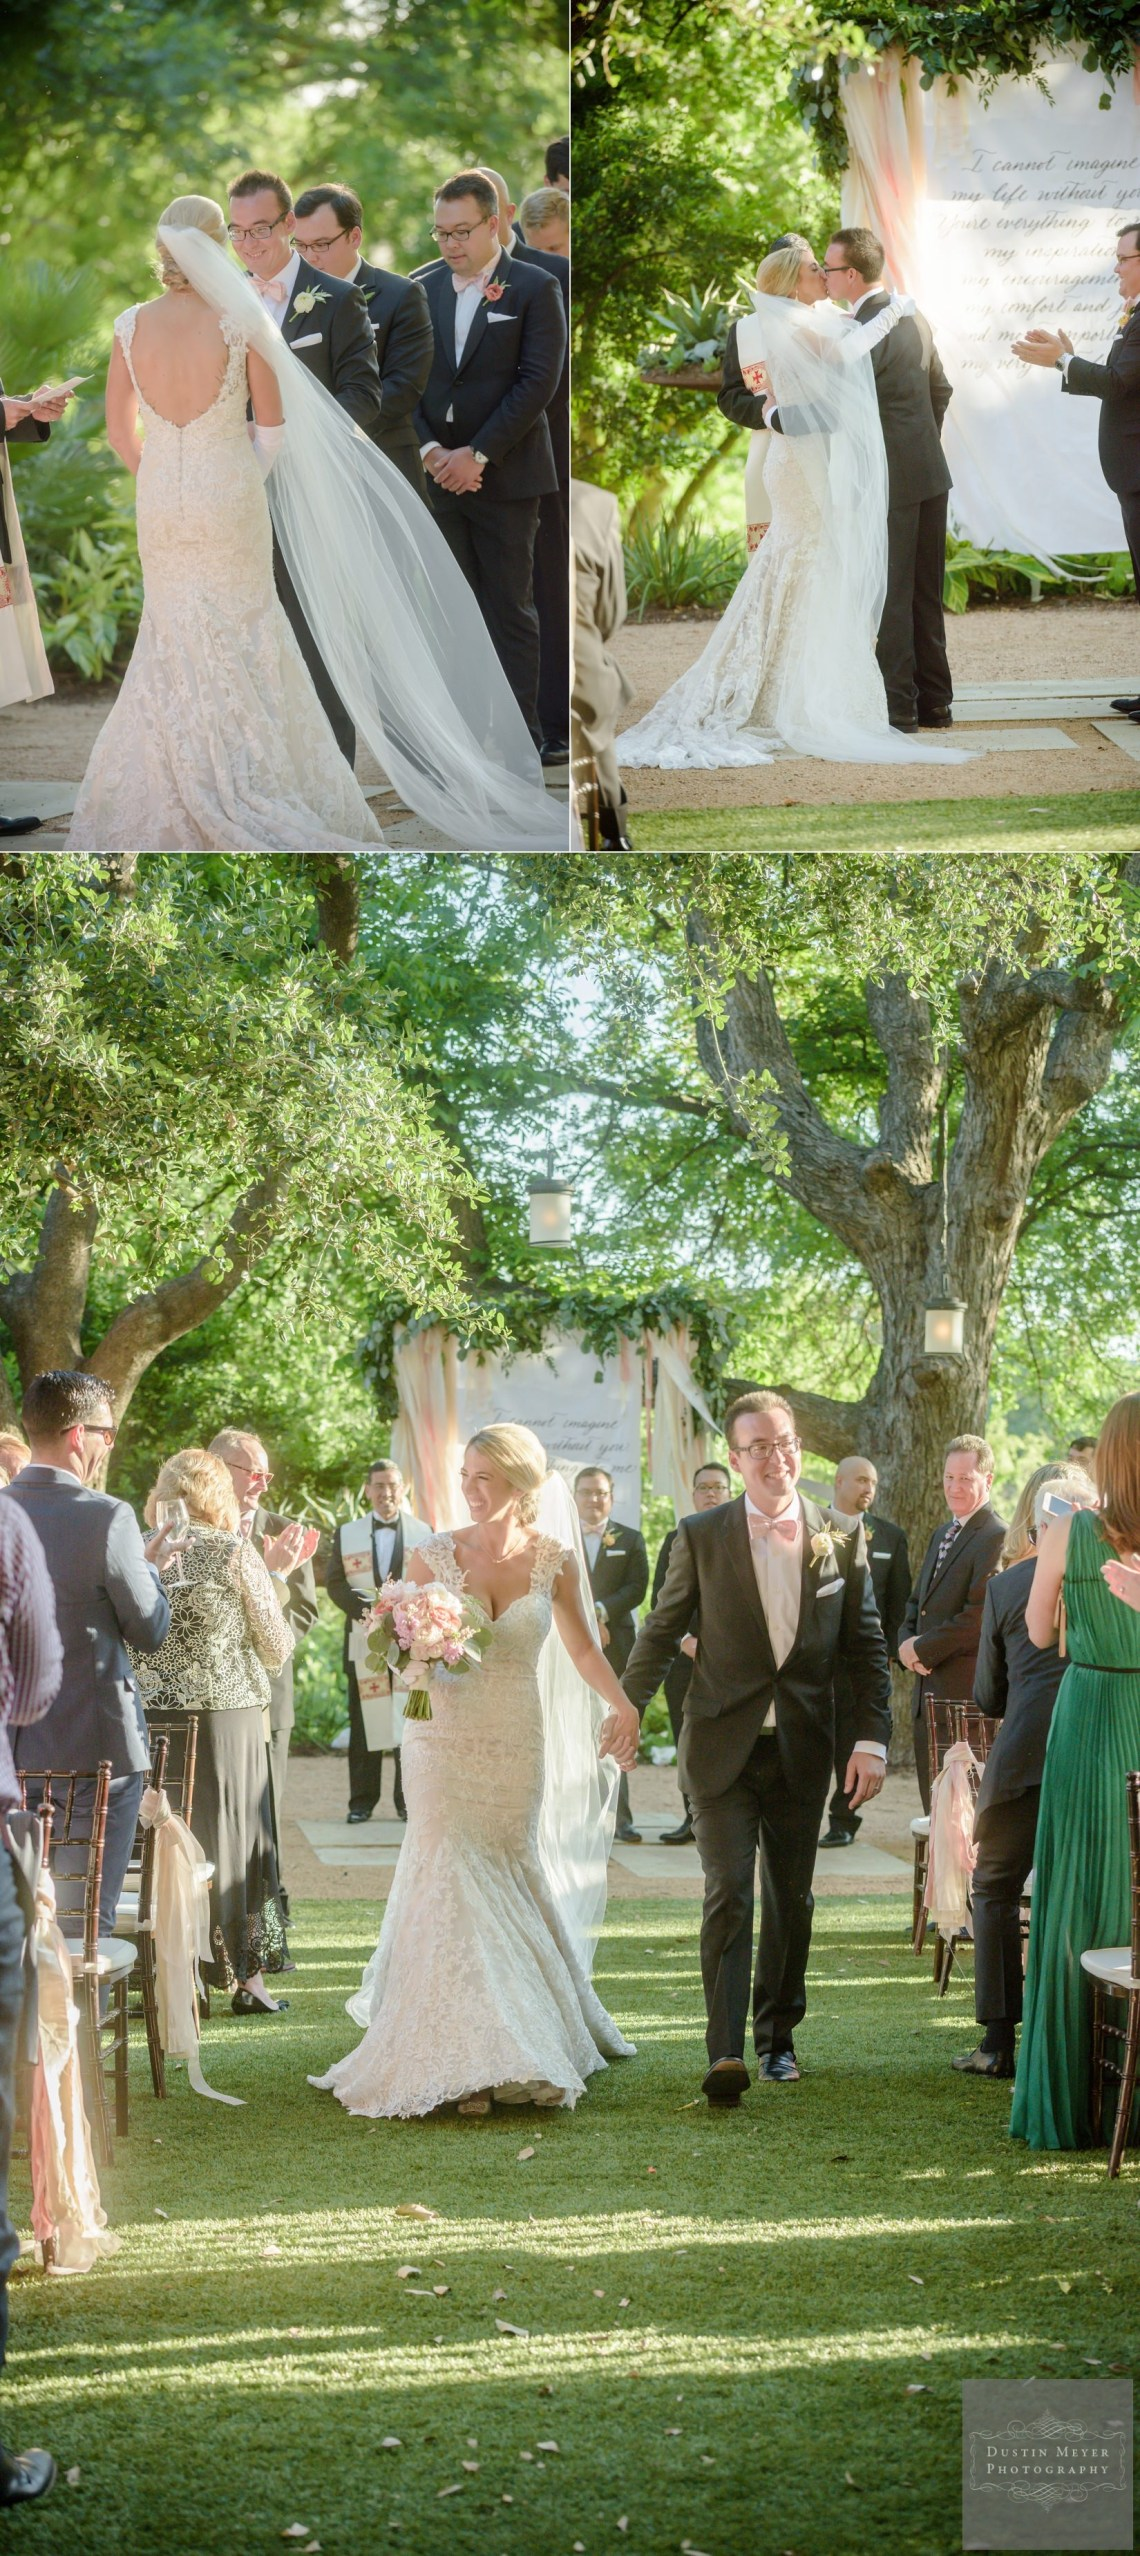 four seasons wedding, bride and groom outdoor wedding ceremony